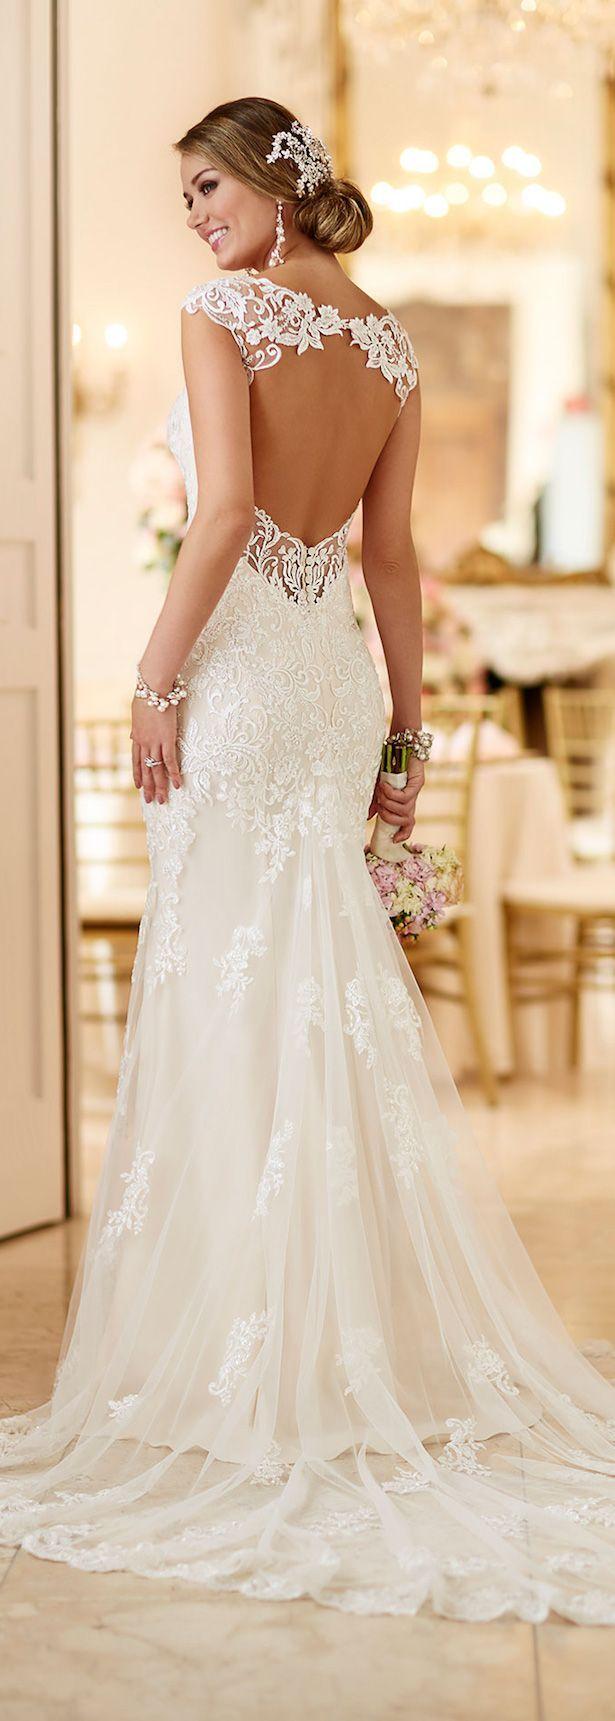 sundress wedding dress Bridal